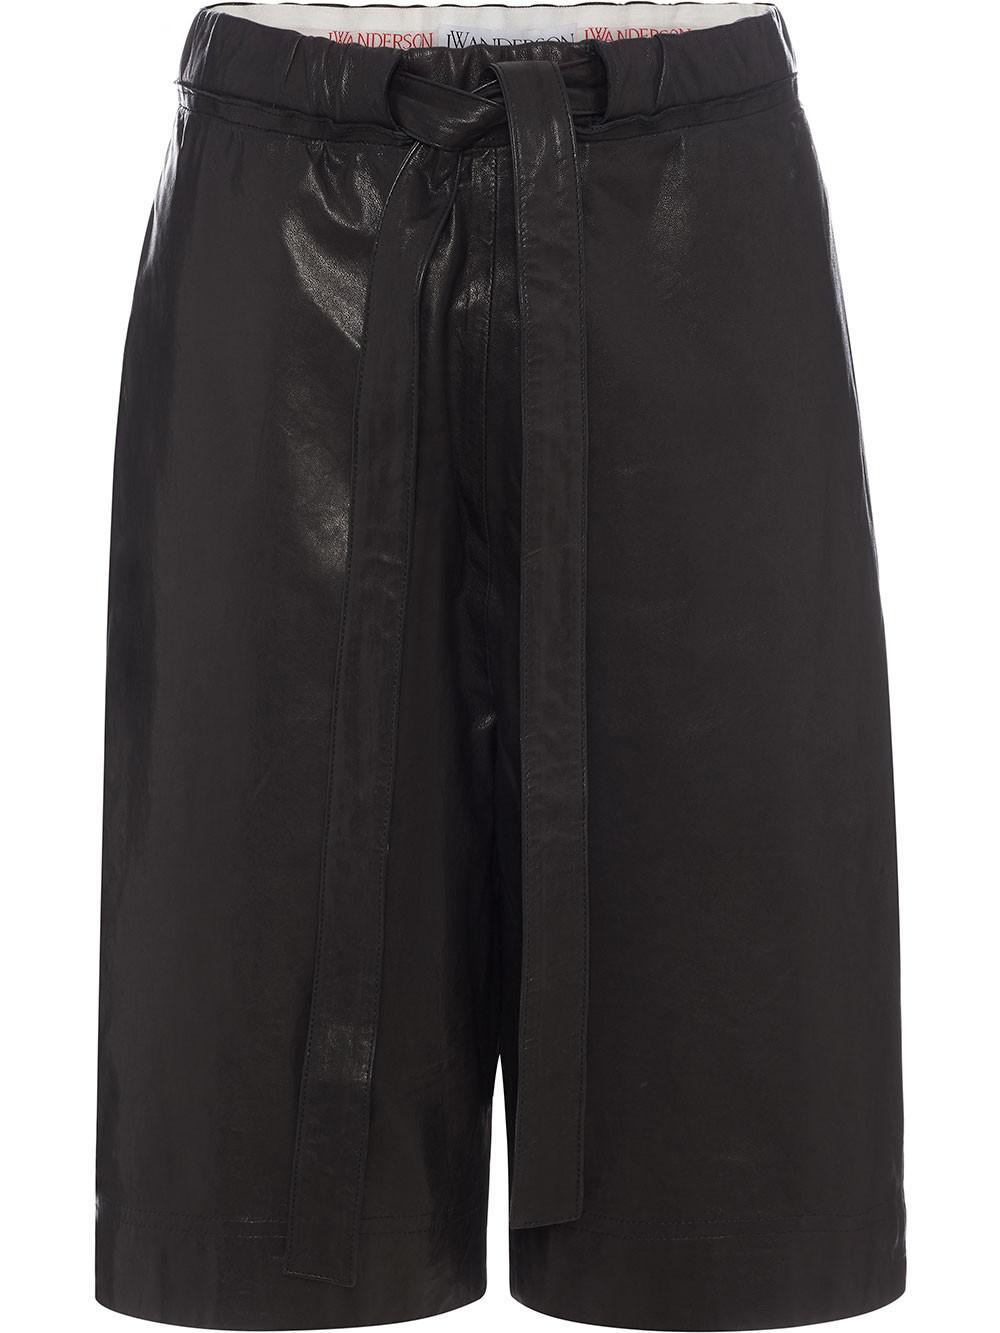 paper shorts - Black J.W.Anderson qmWSi